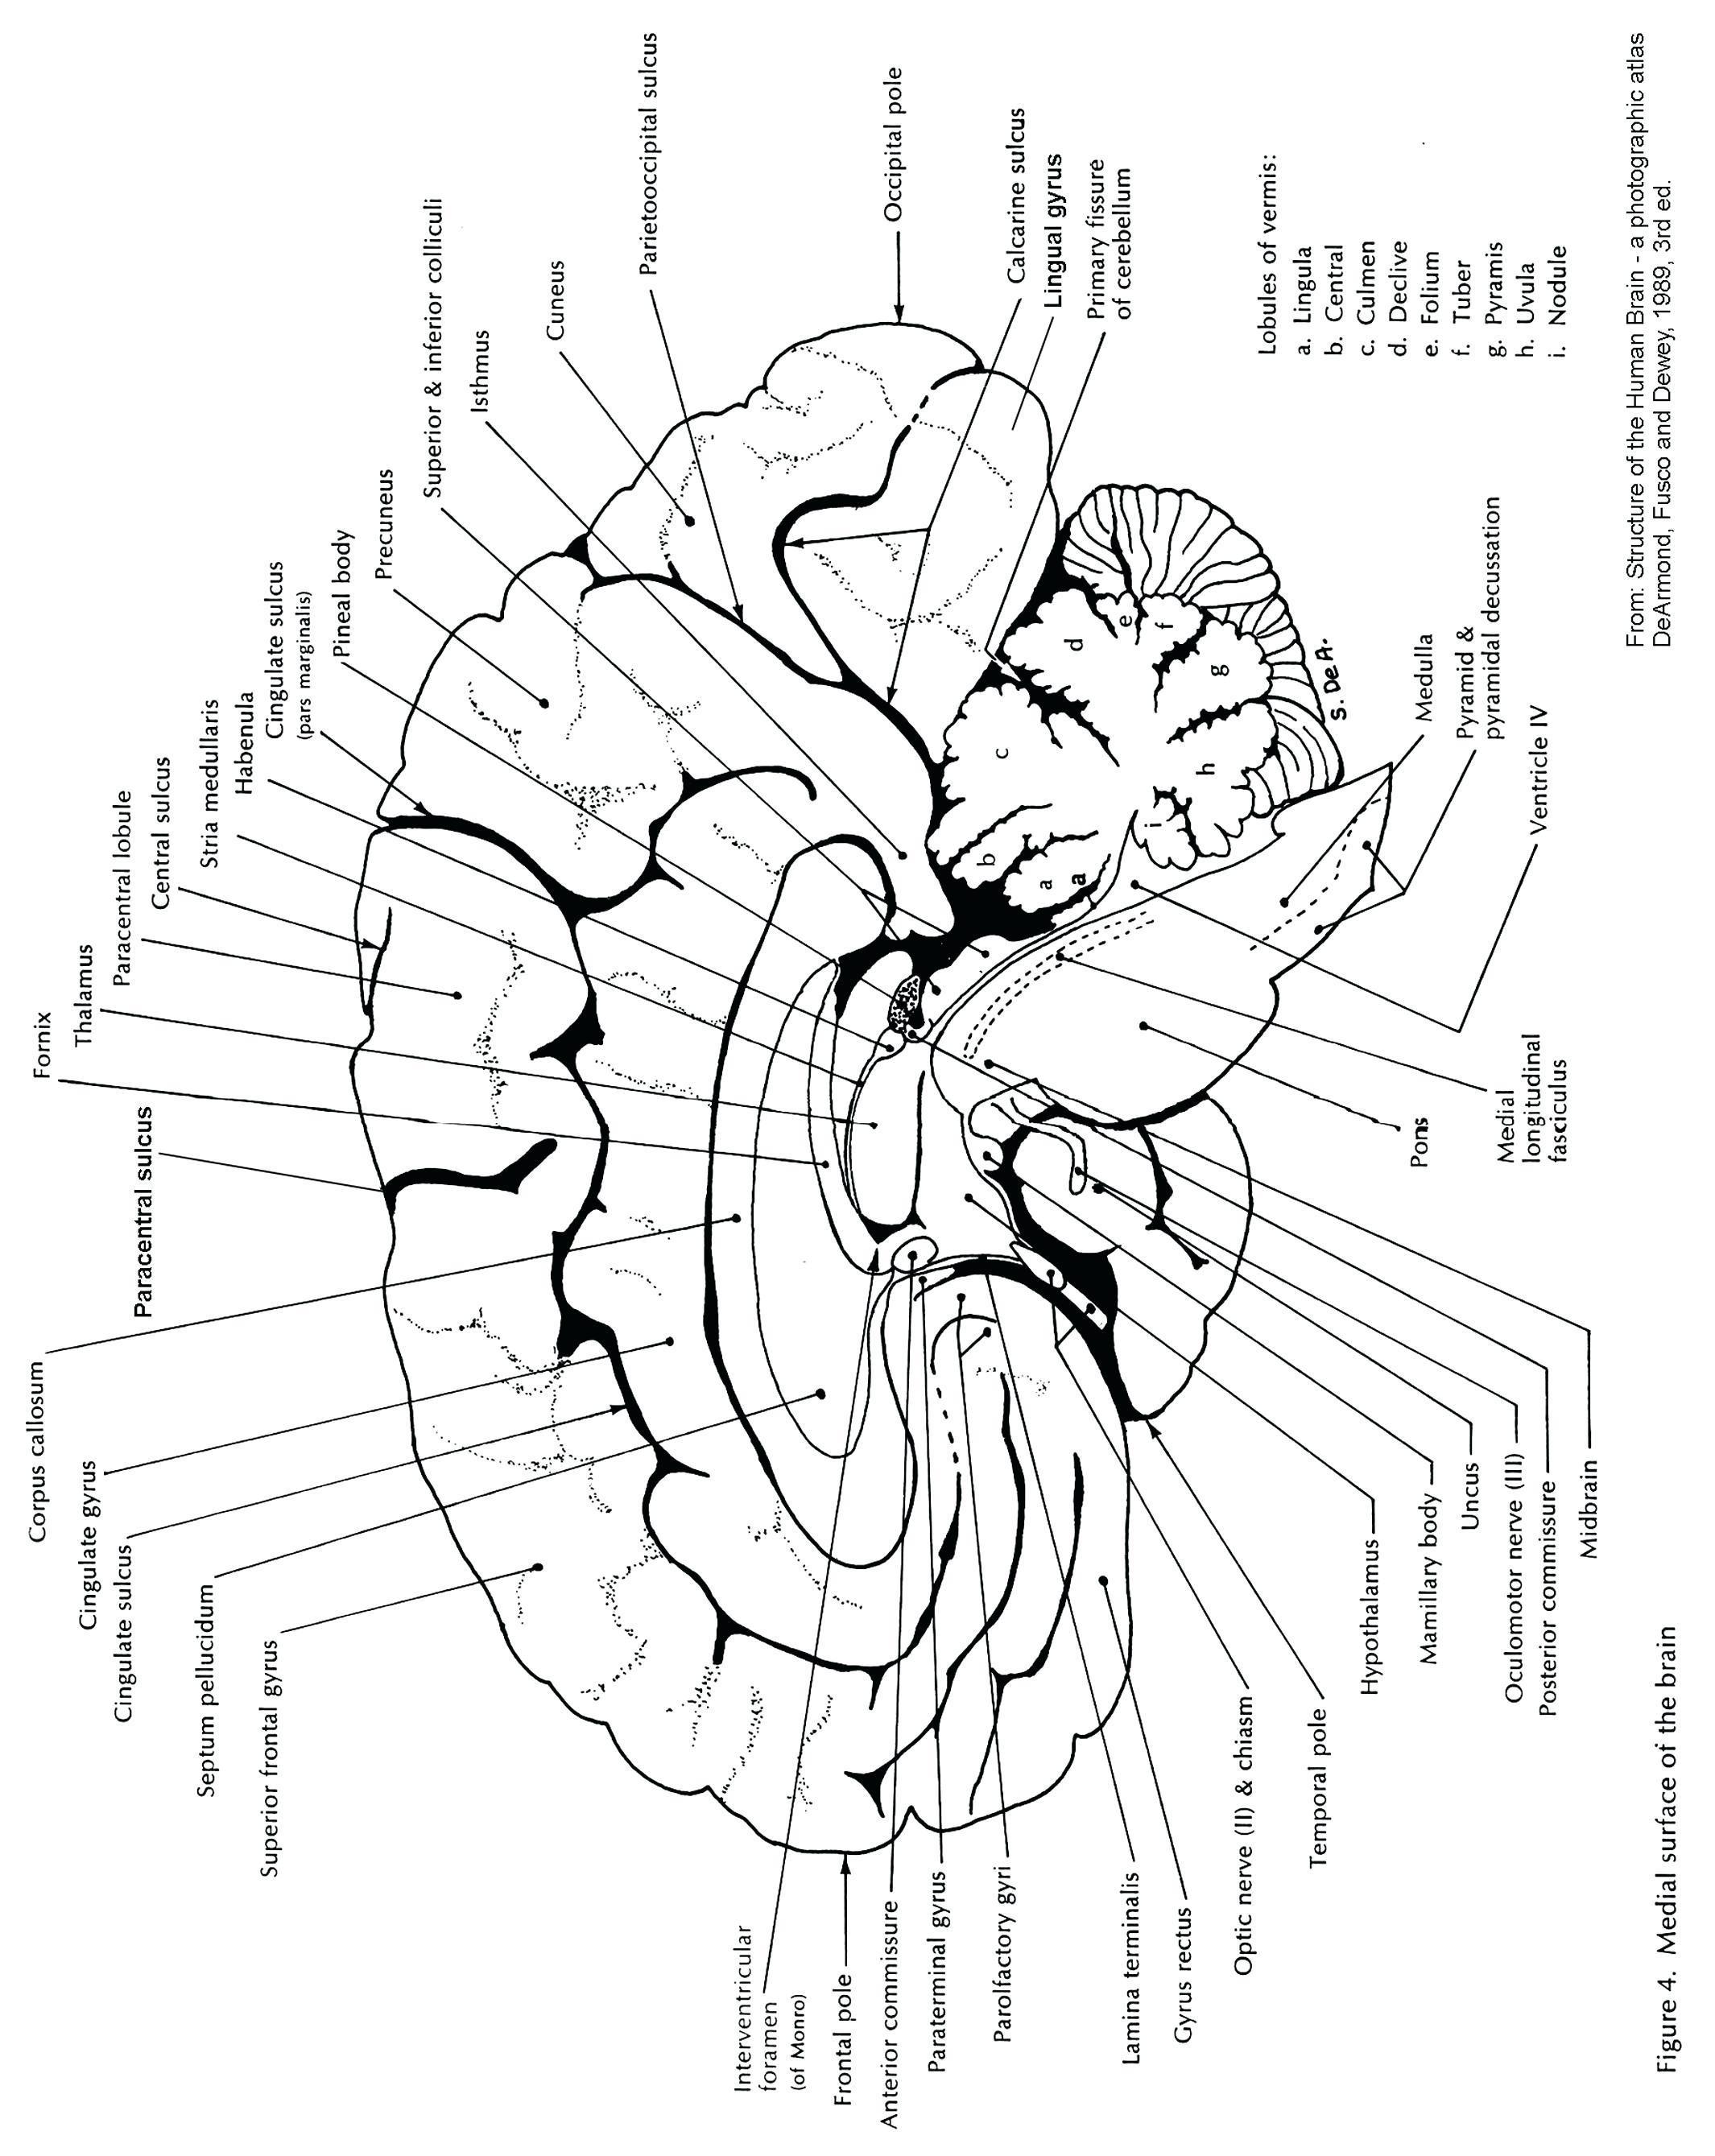 Brain And Its Parts Drawing At Getdrawings